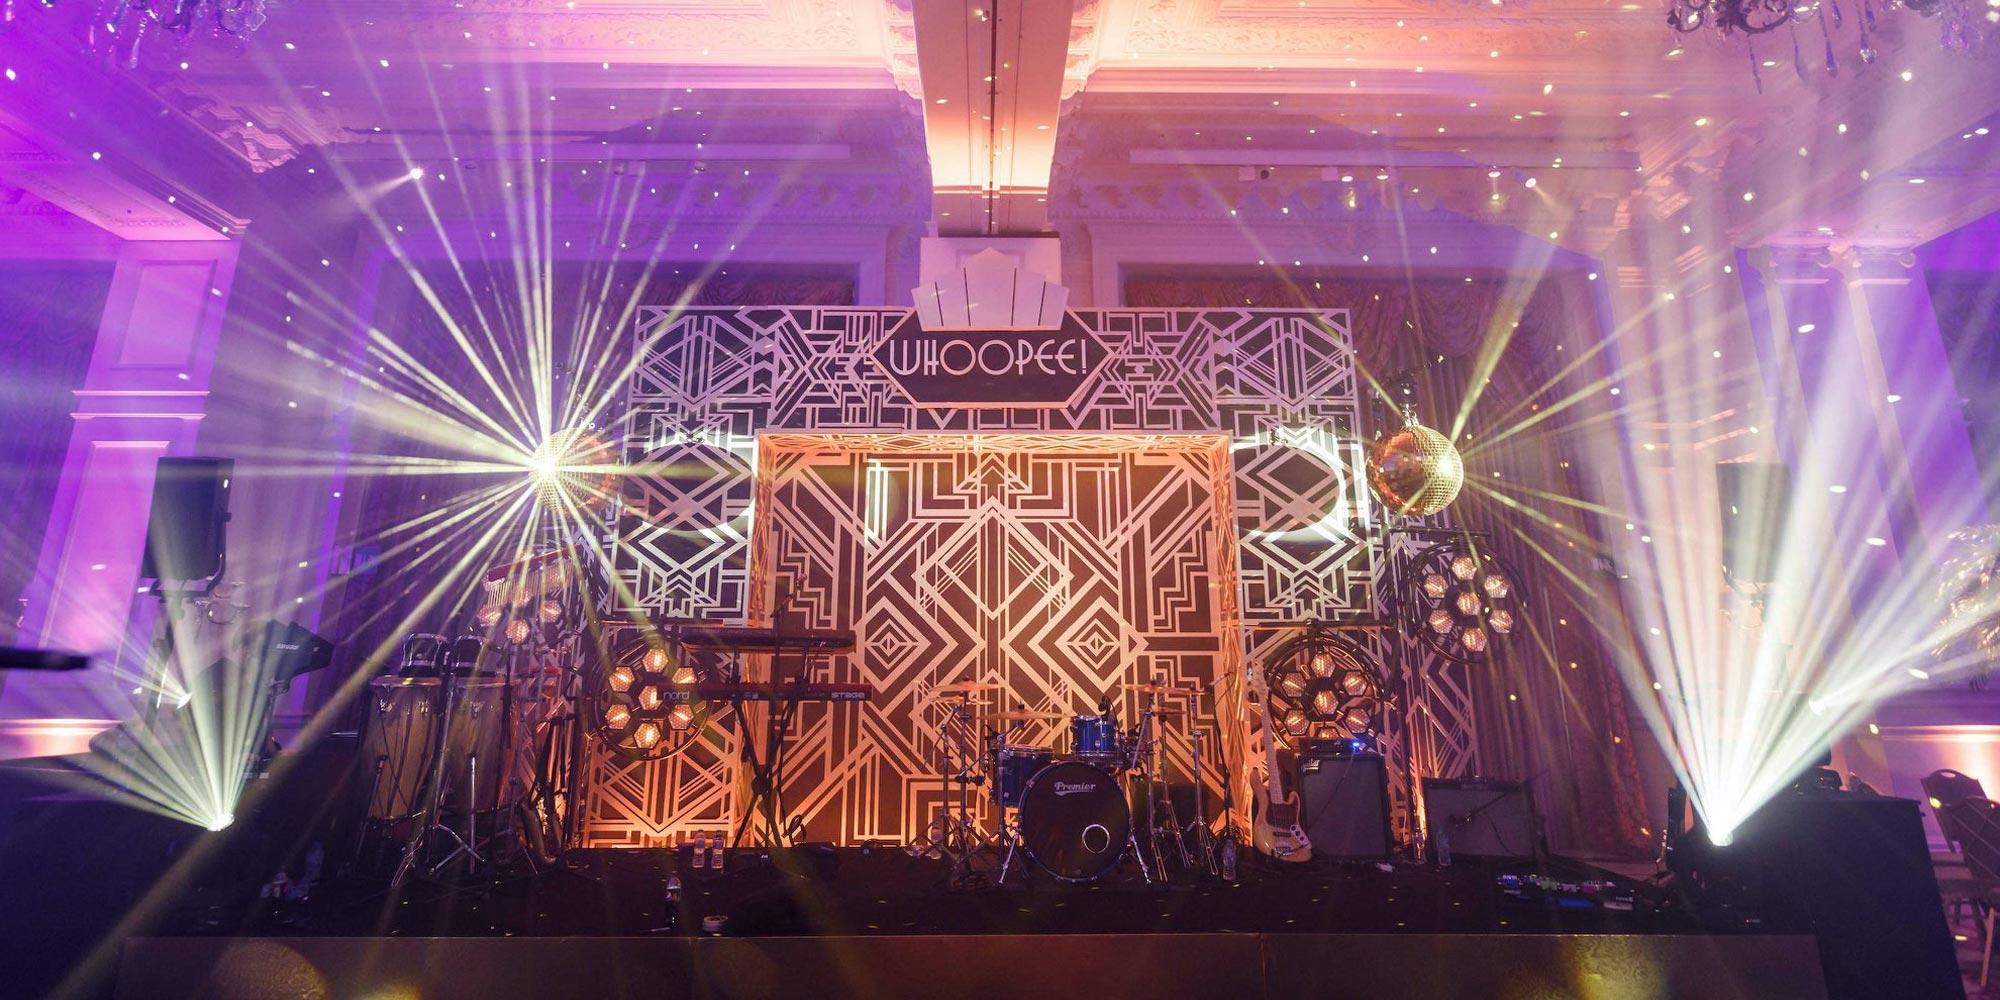 Wedding stage lighting sound system dance floor